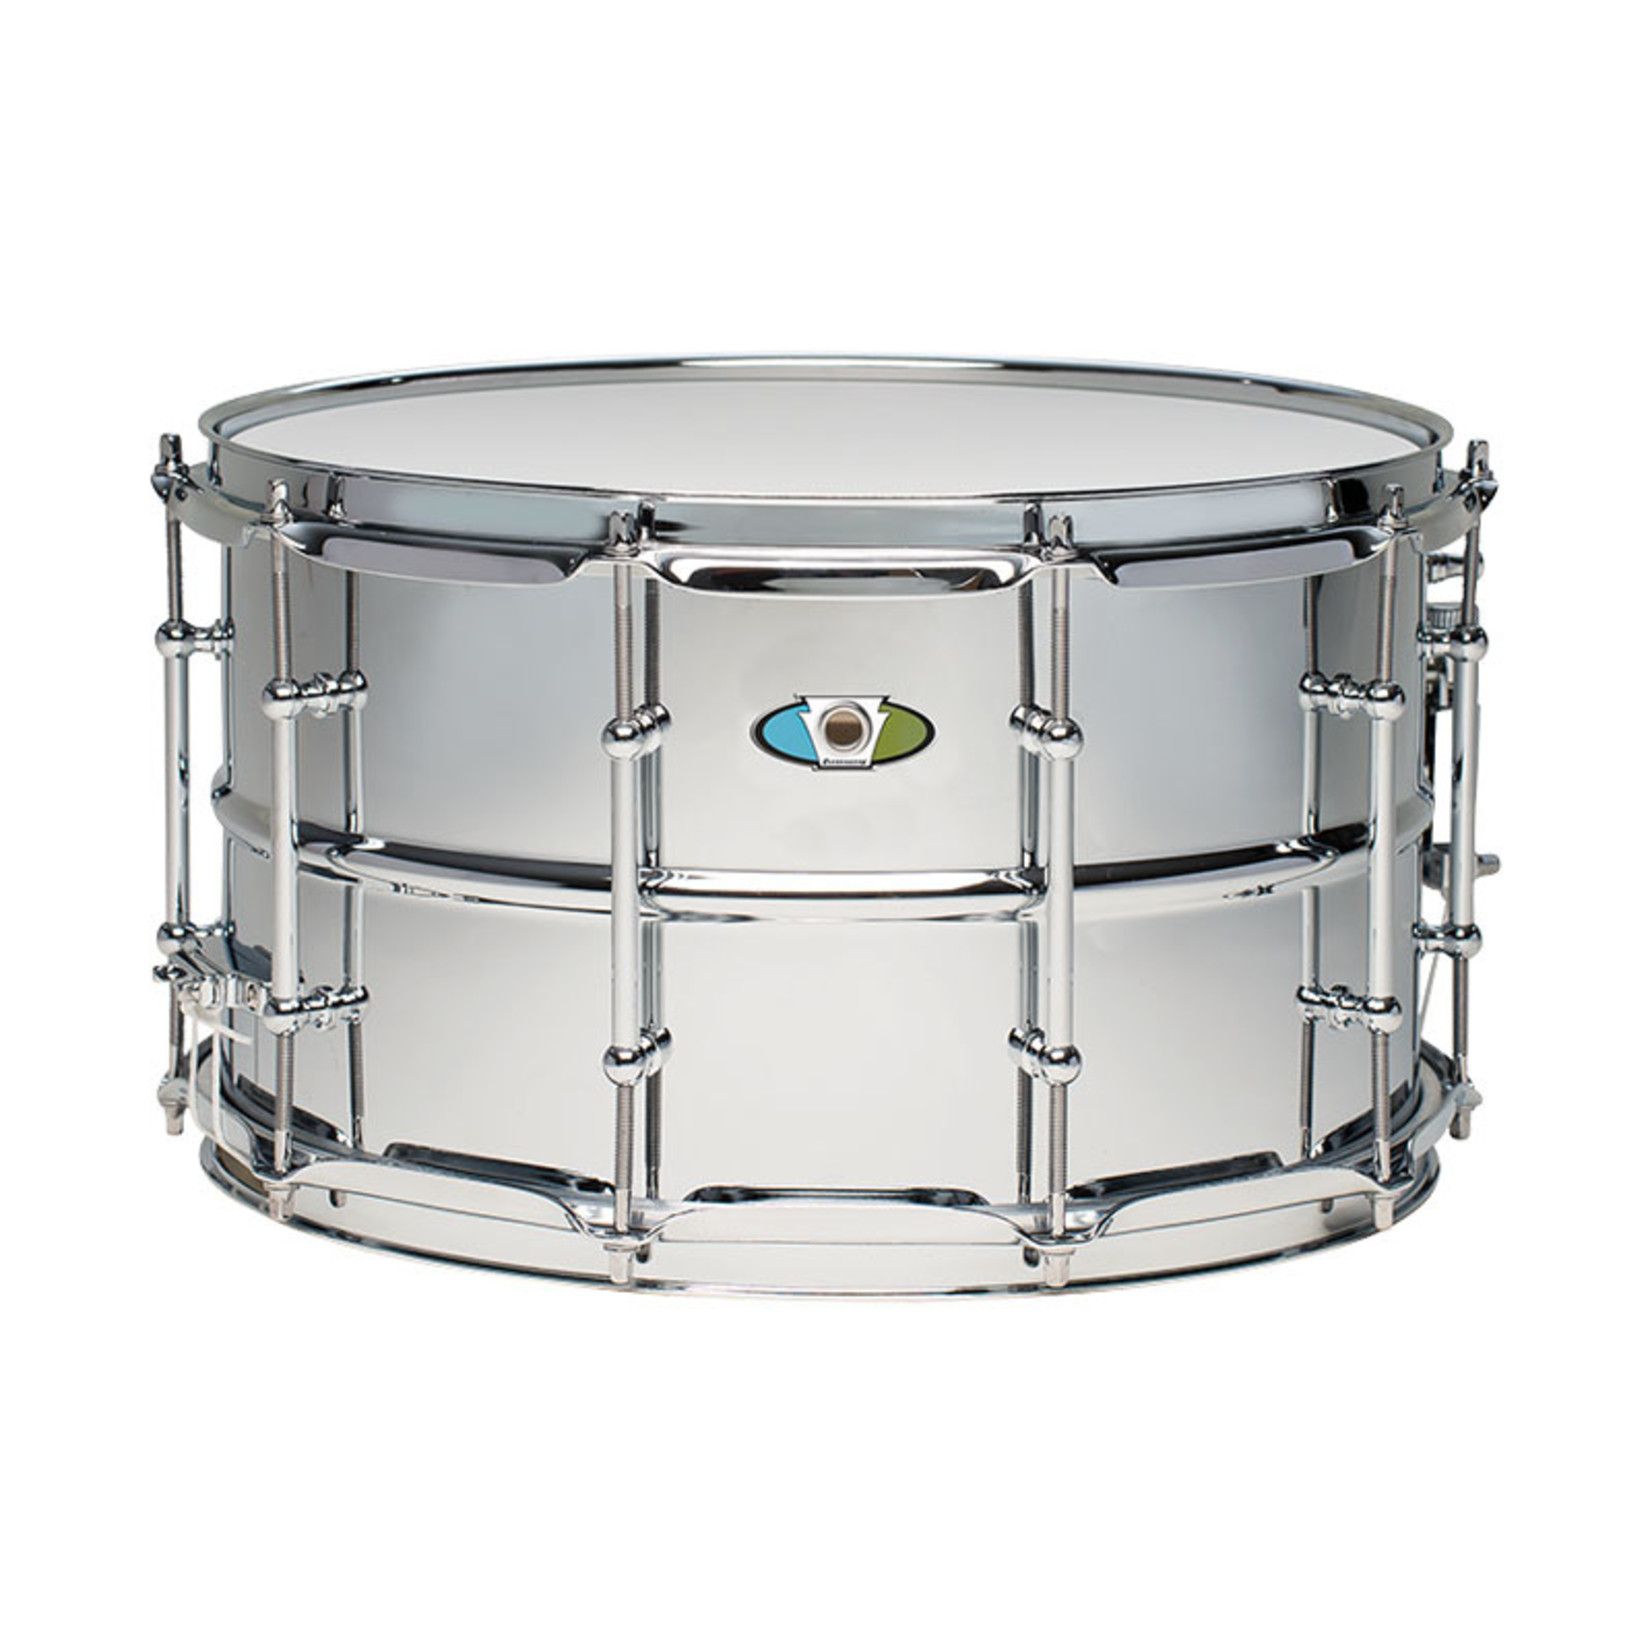 Ludwig Ludwig 8X14 Supralite Snare Drum